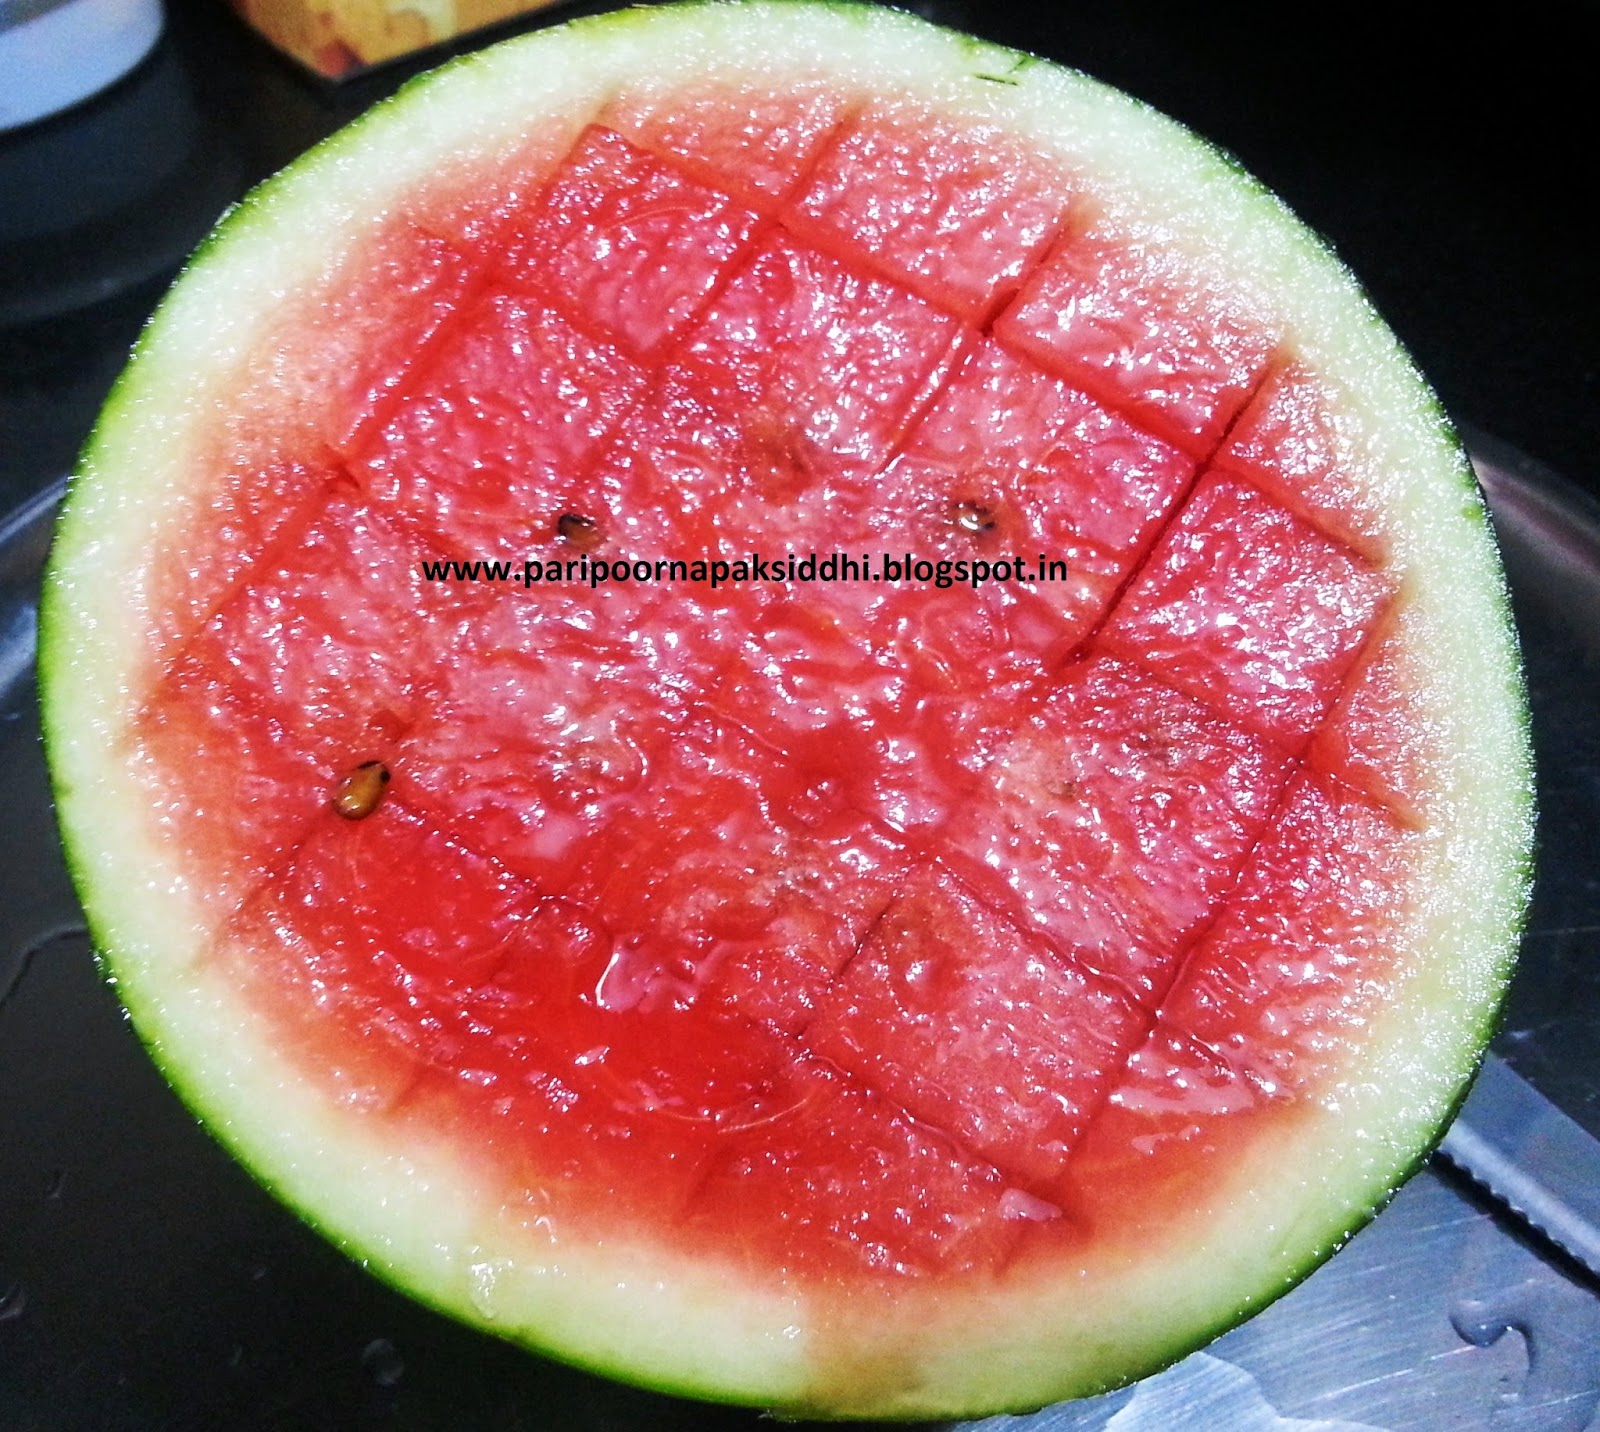 paripoorna paksiddhi watermelon sorbet. Black Bedroom Furniture Sets. Home Design Ideas